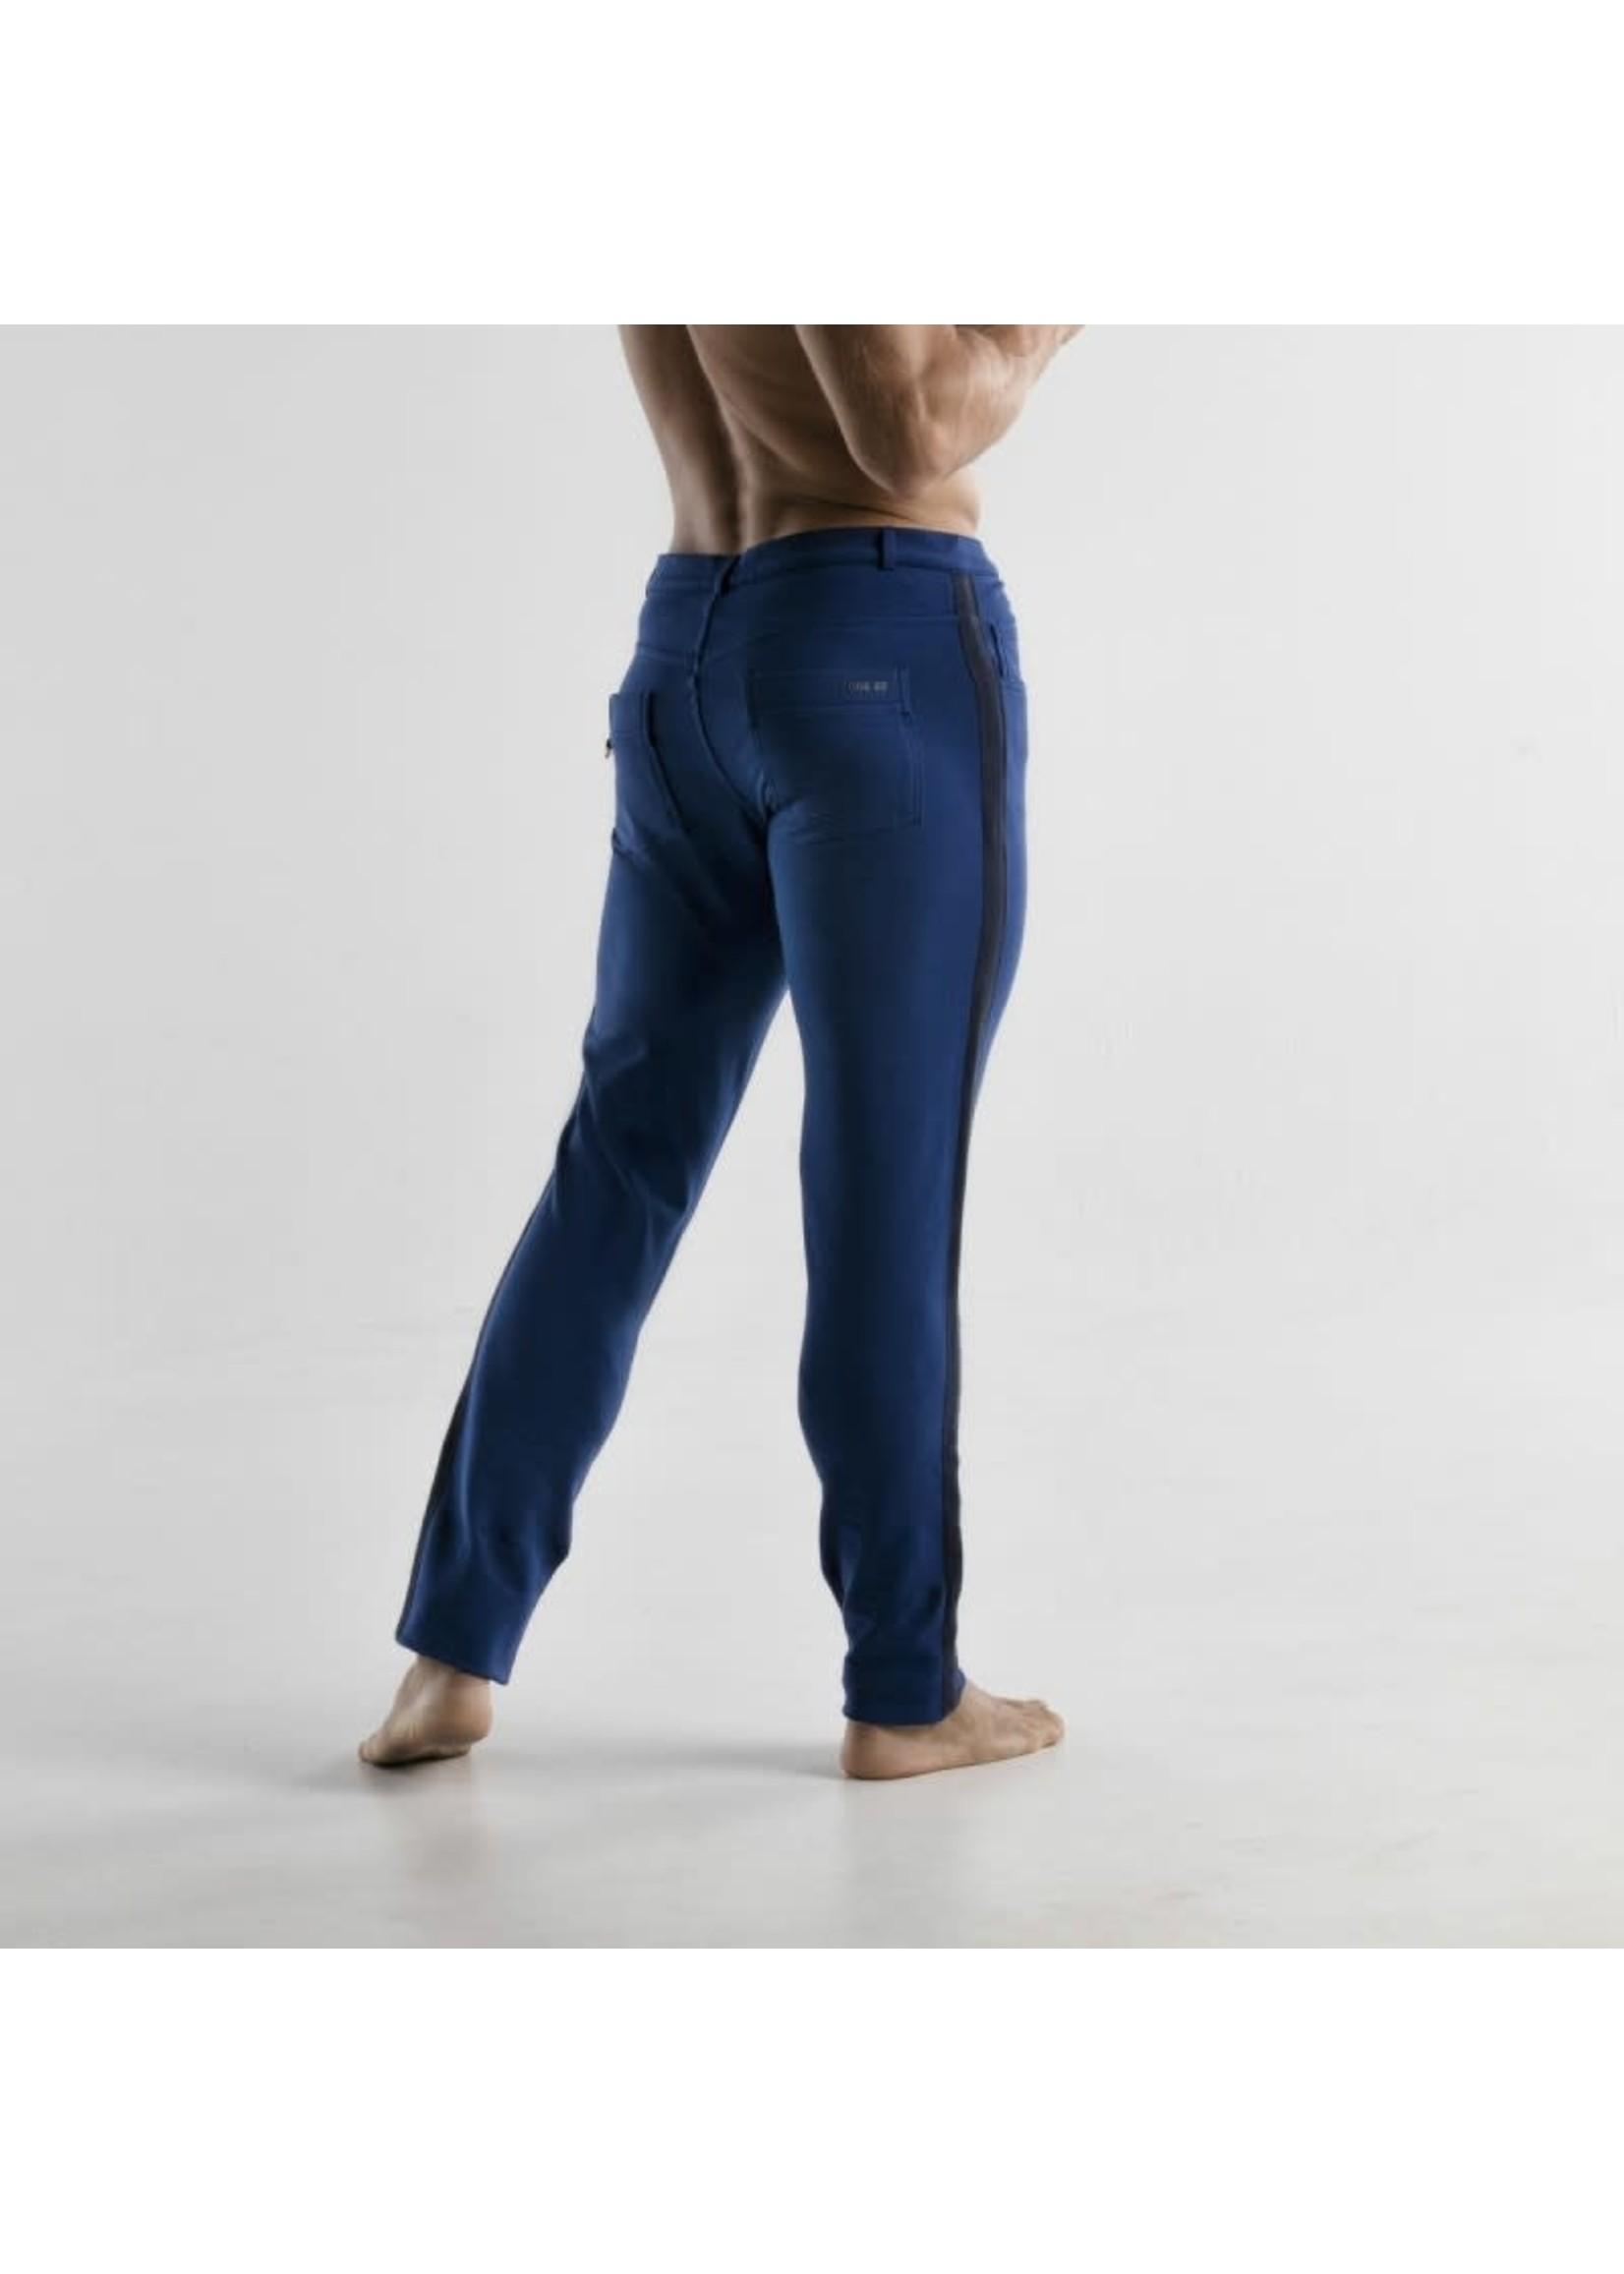 Code 22 Code 22 Stretch 5 Pocket Pants